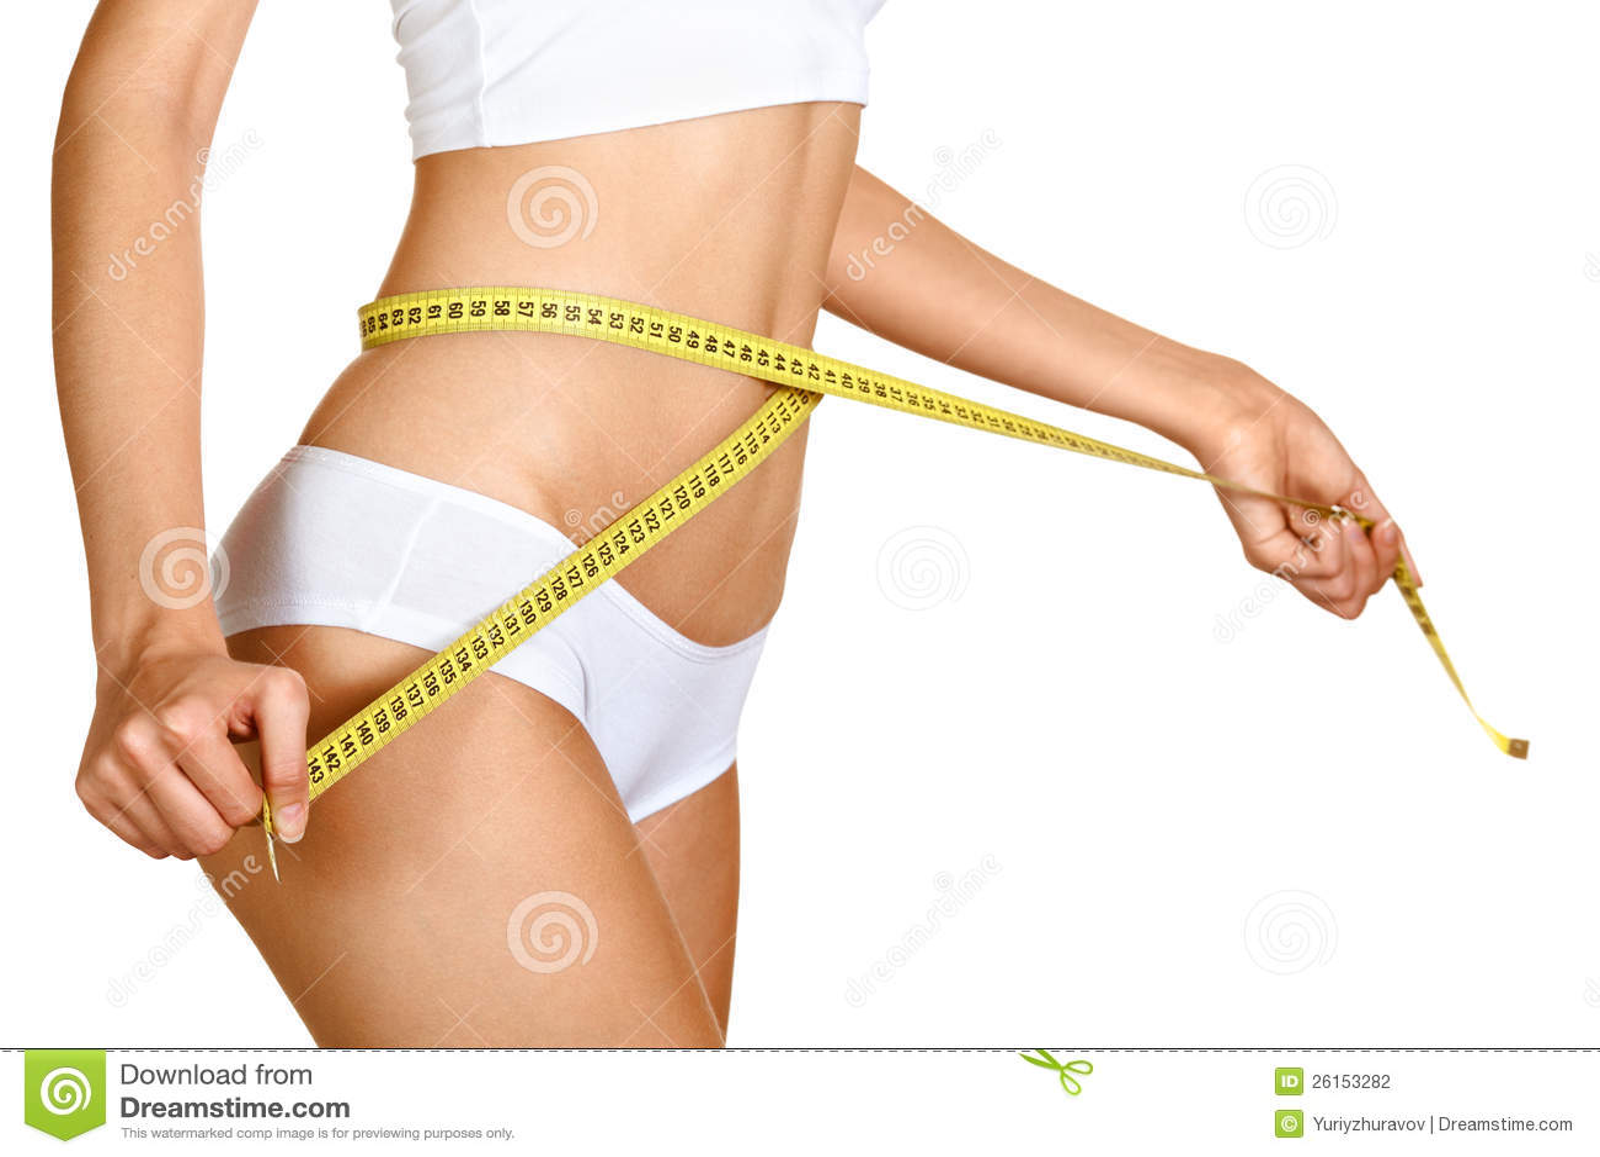 Woman measuring her waistline. Perfect Slim Body